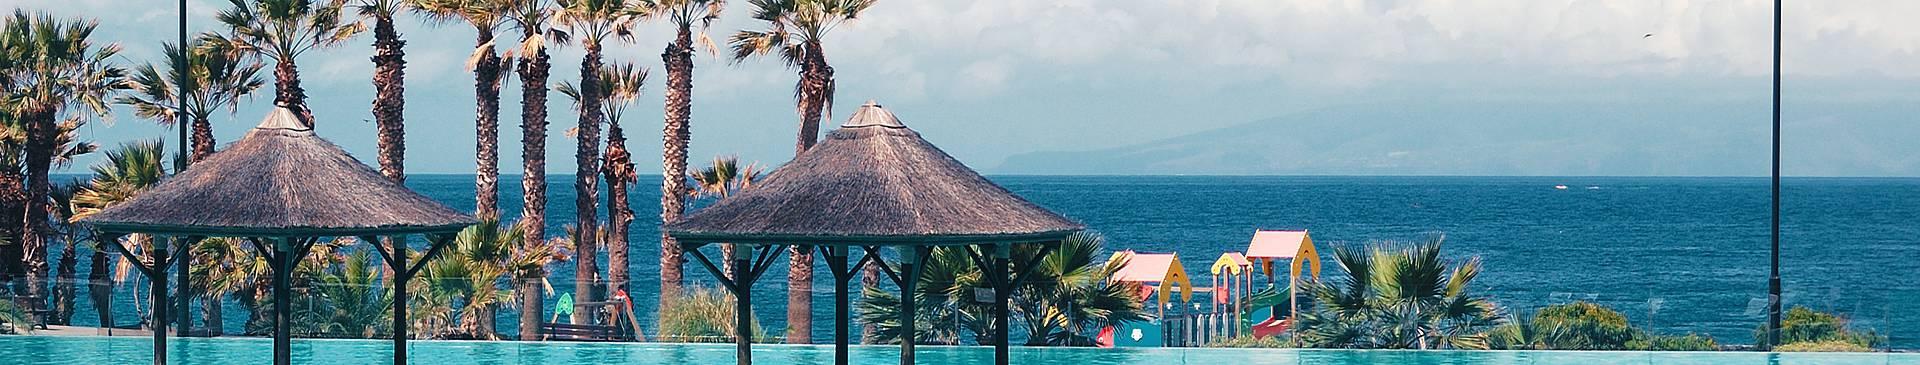 Luxury Spain Vacations